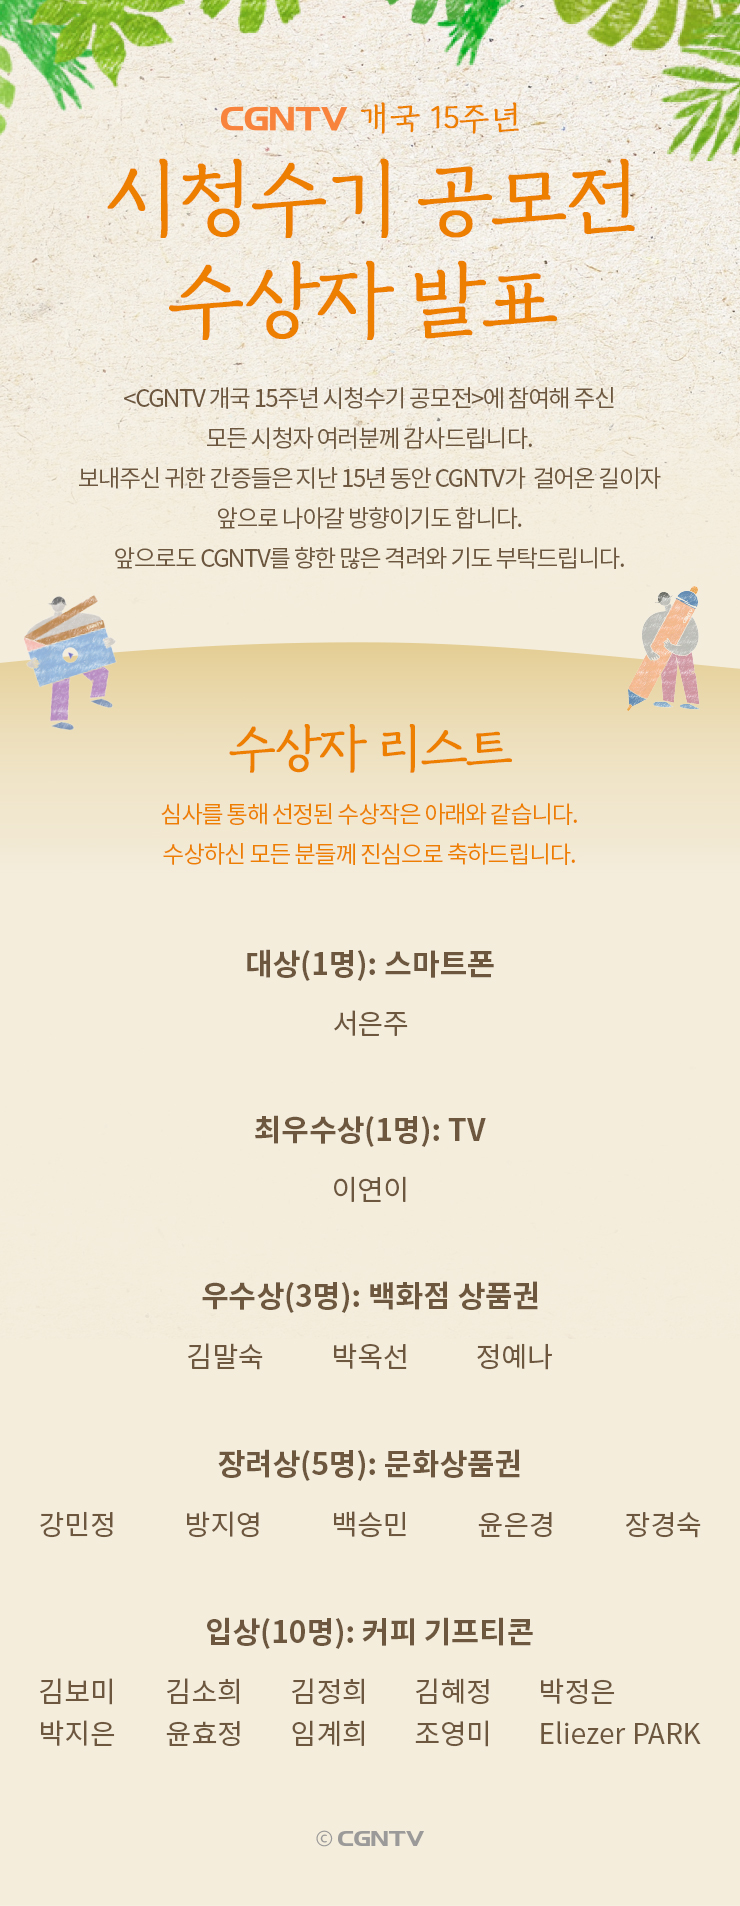 CGNTV 개국 15주년 시청수기 공모전 수상자 발표